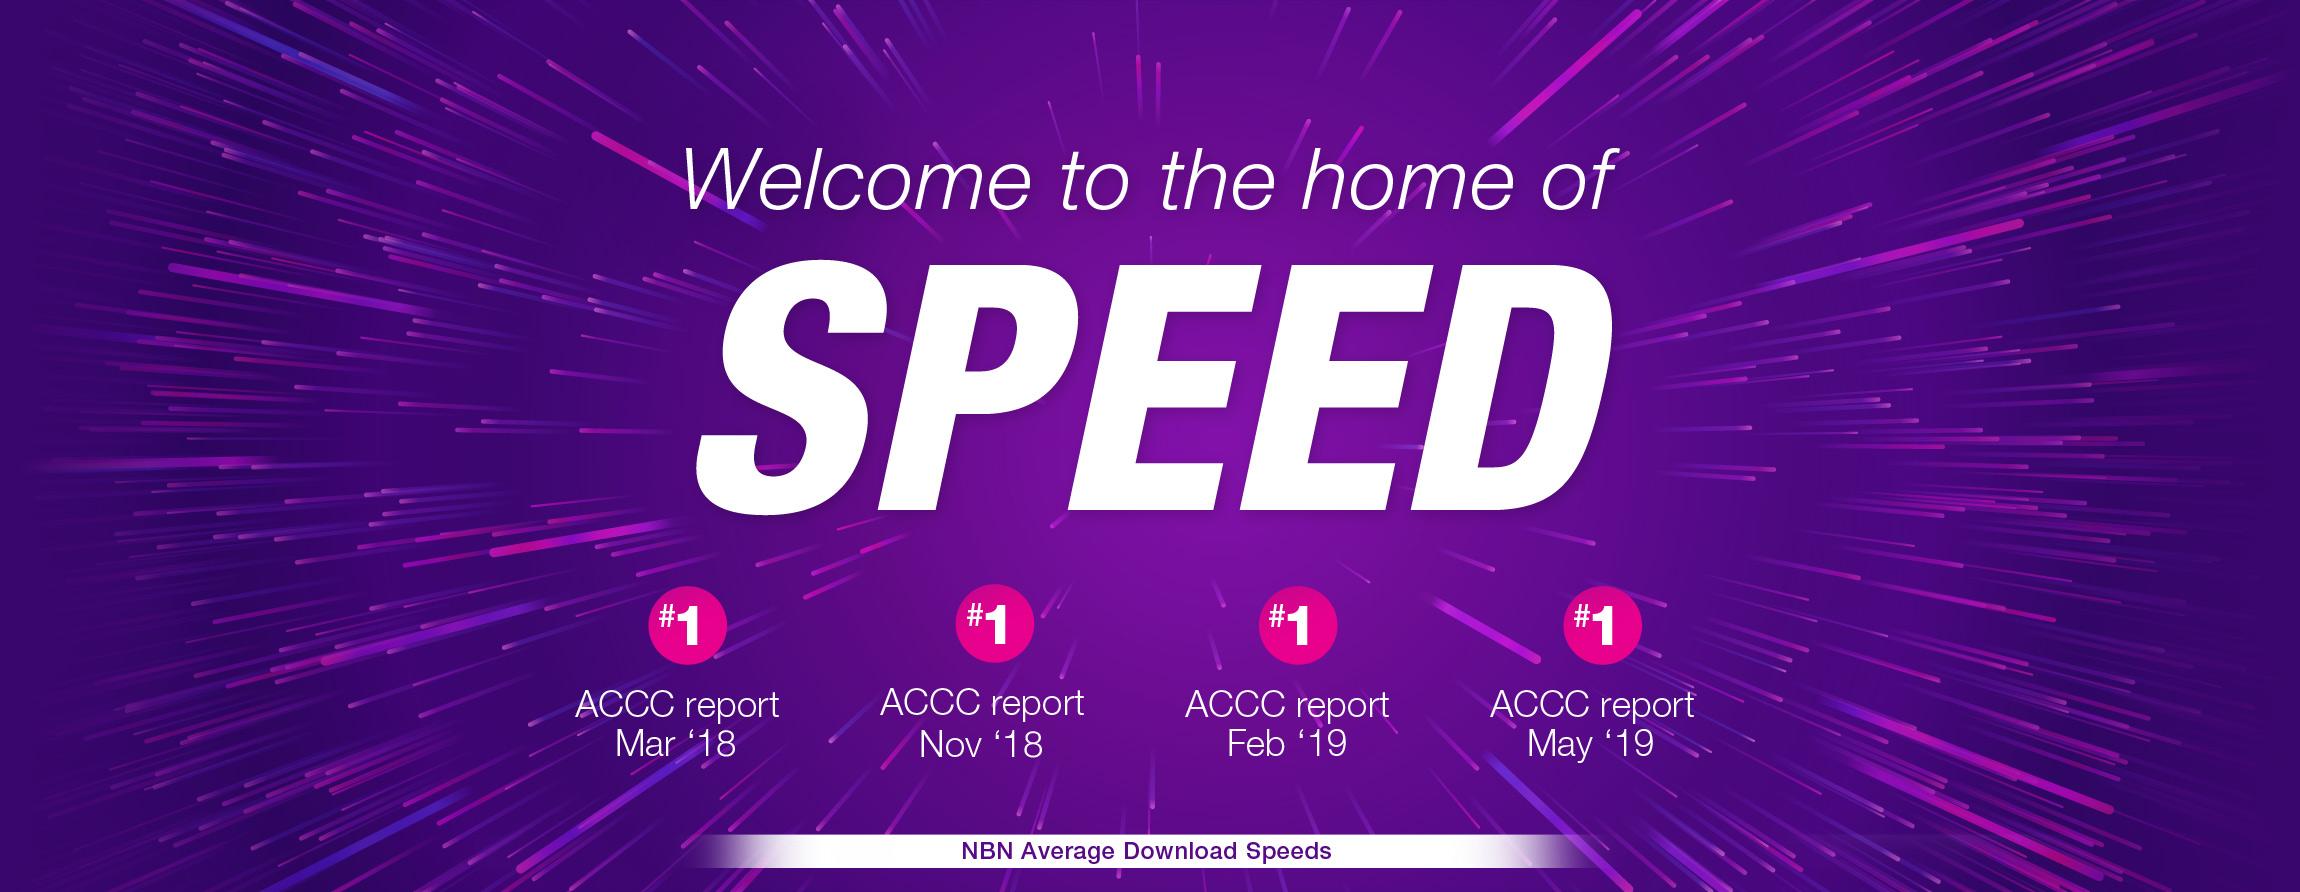 internet broadband provider for nbn adsl2 fttb and mobile